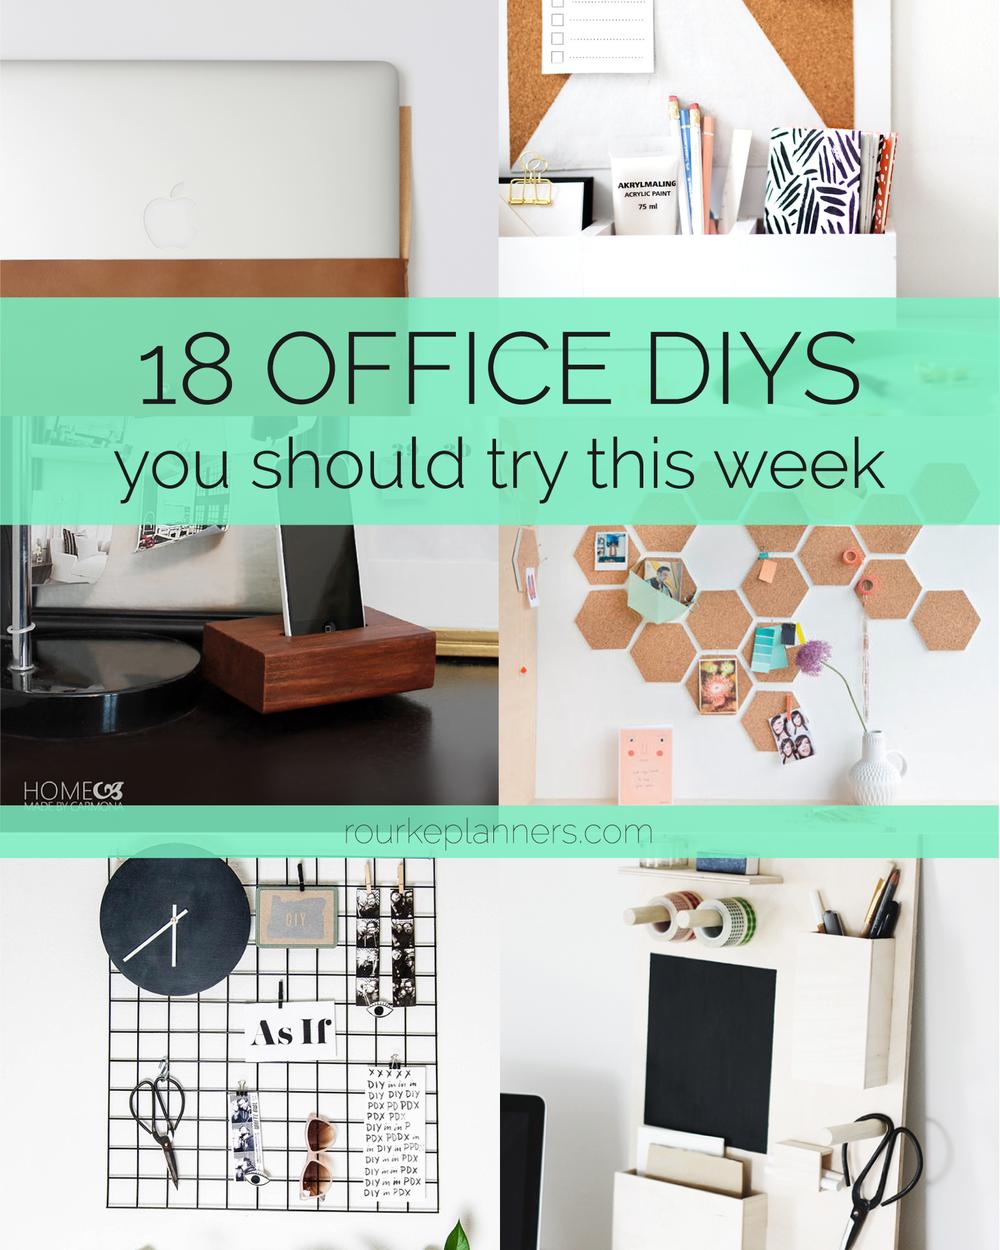 18 Office DIYs to try this week | Rourke Planners